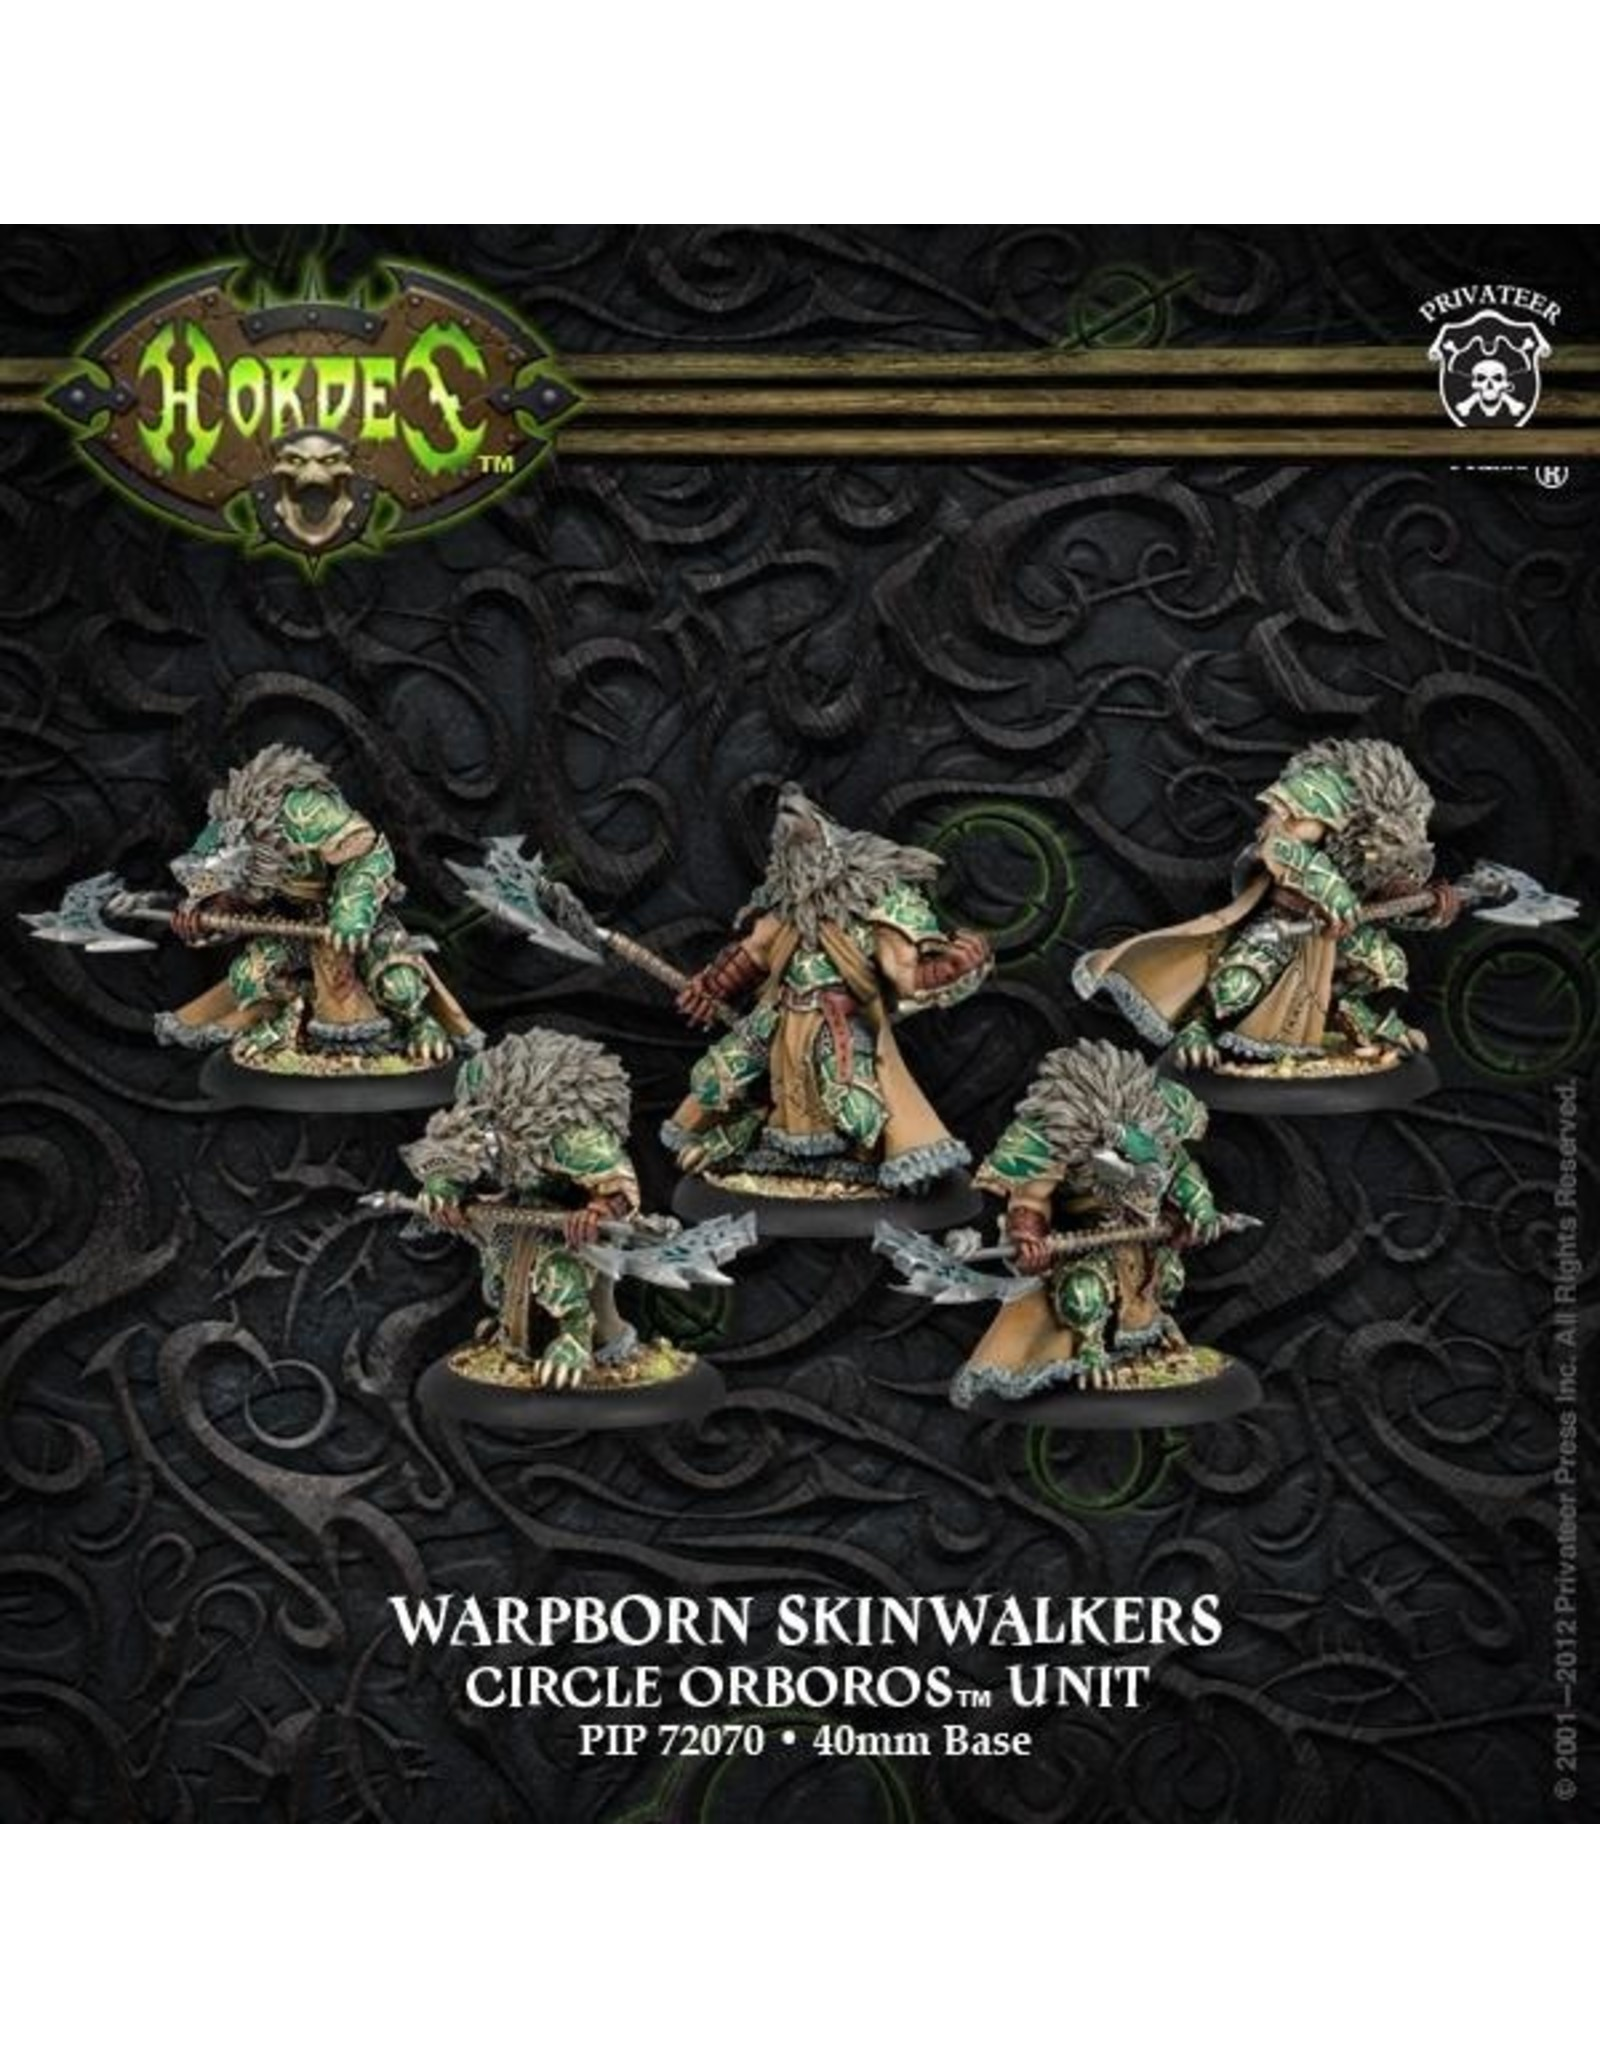 Hordes: Circle Orboros Warpborn Skinwalker